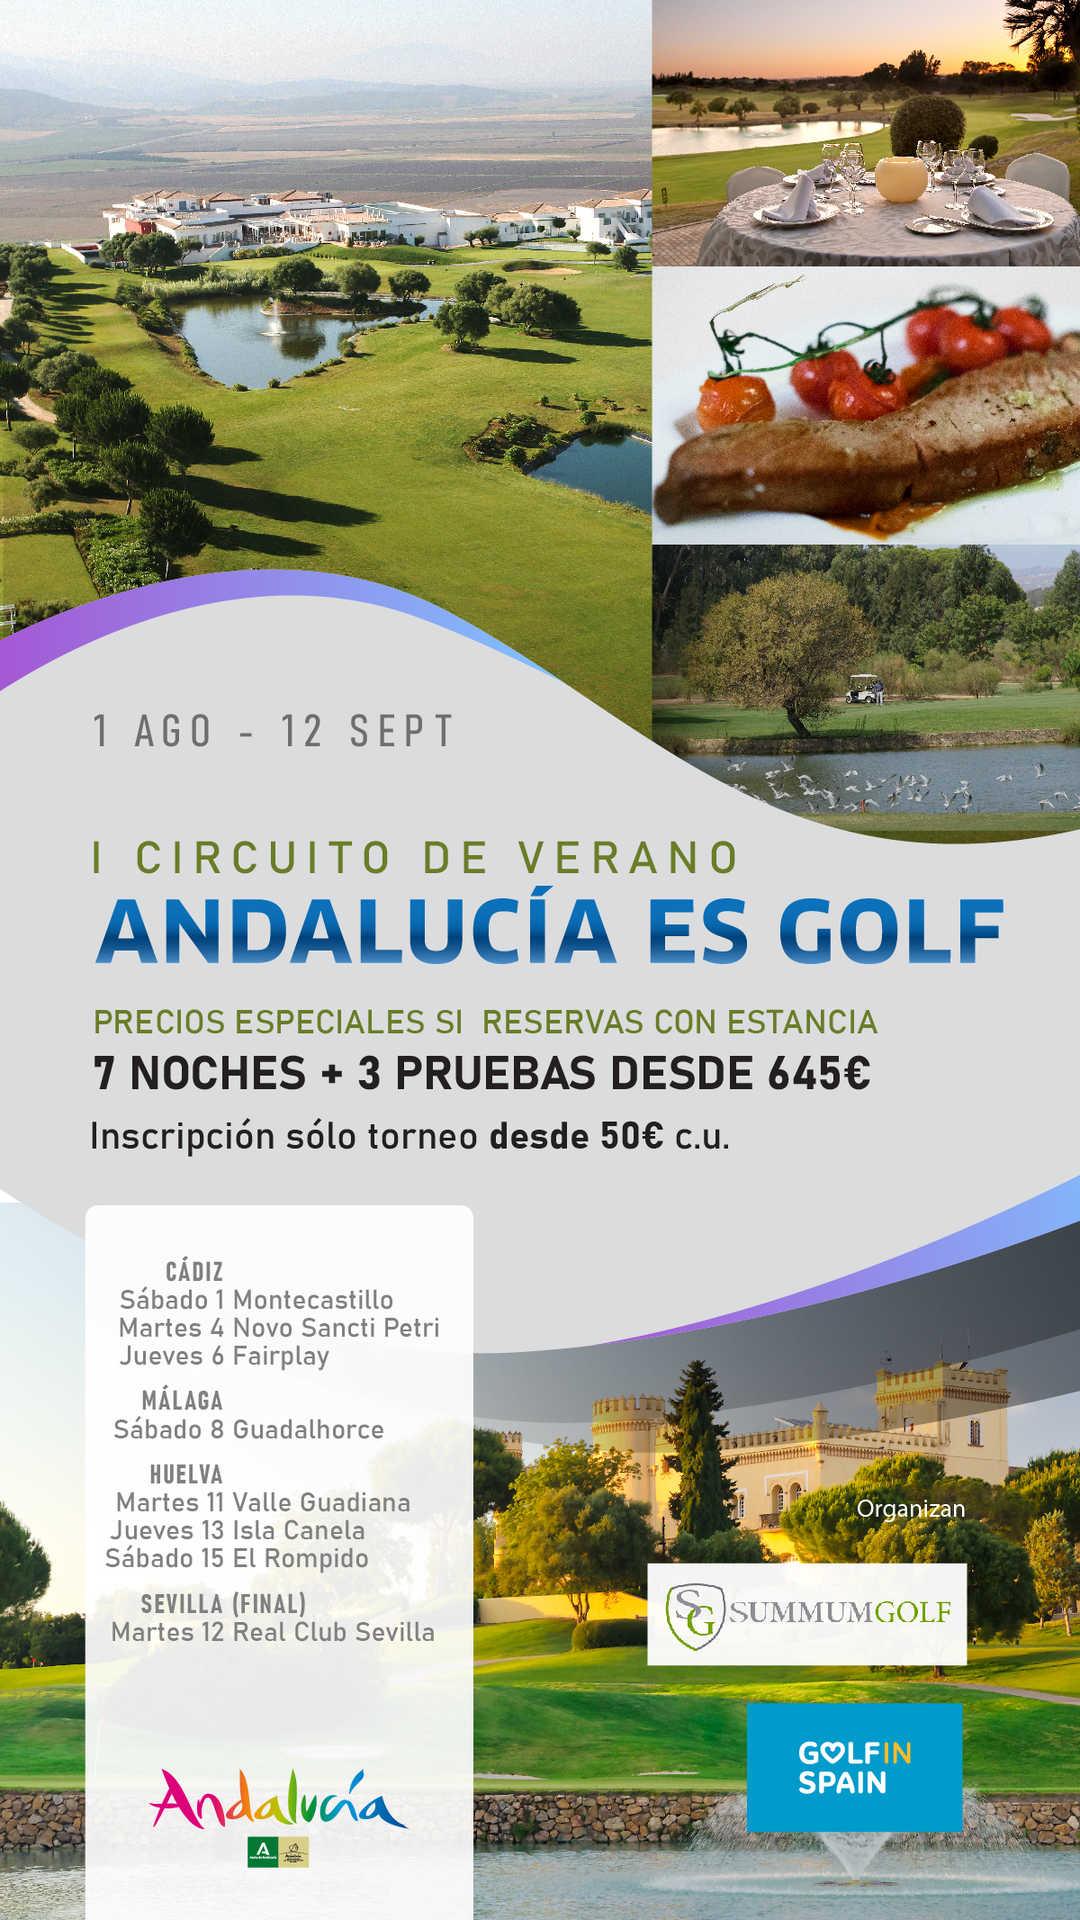 Circuito de Verano Andalucía es Golf